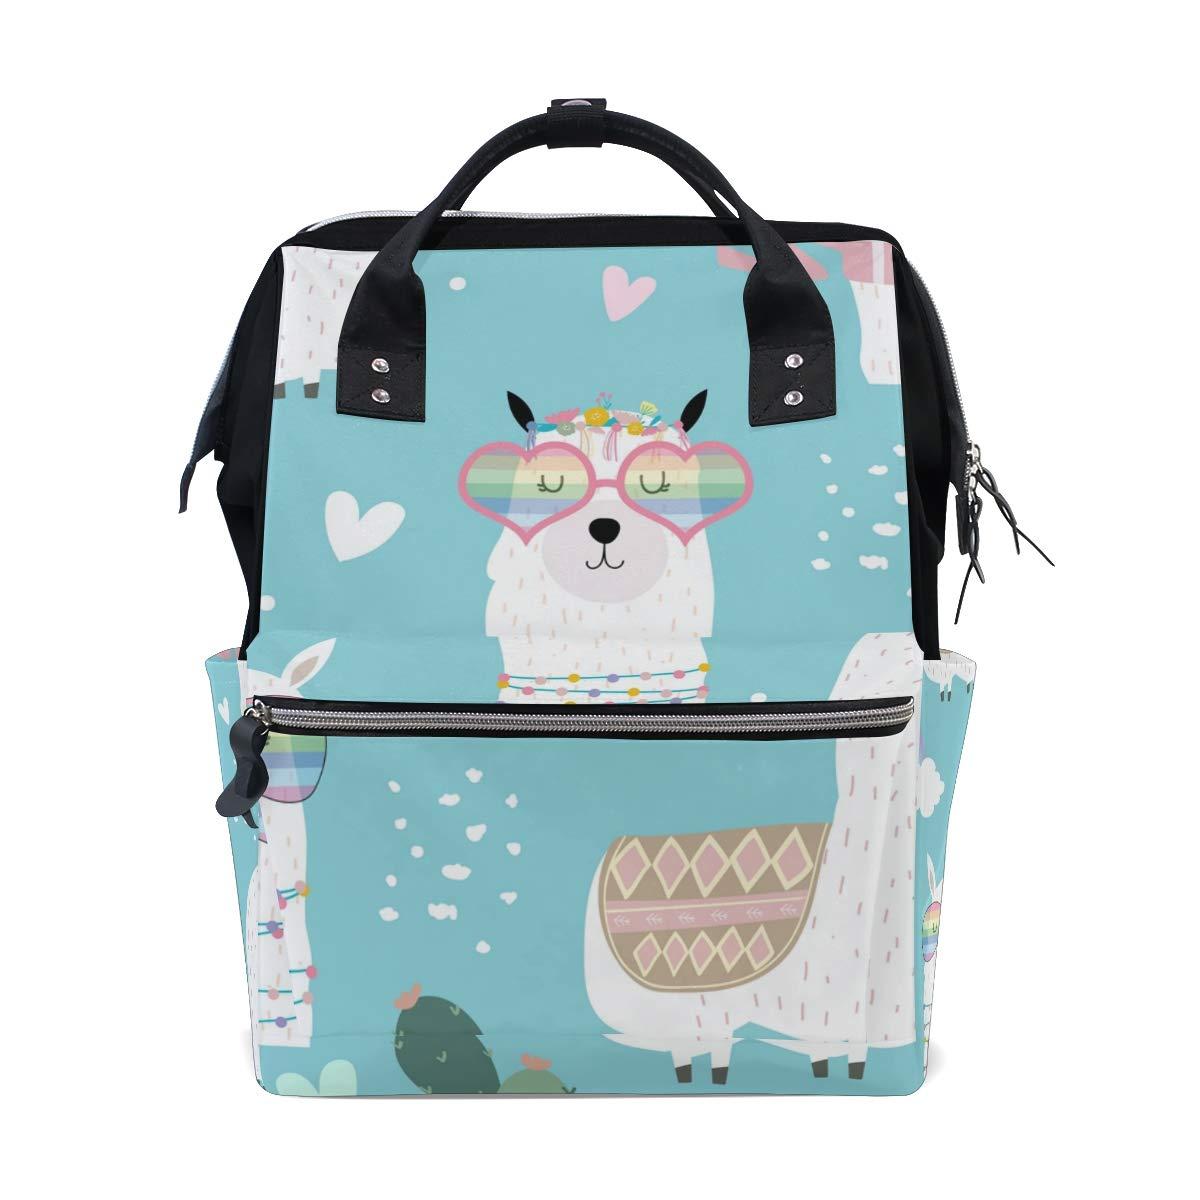 A Seed Backpack Baby Diaper Bag Blue Llamas Rainbow Cactus for Girls Women Tote Daypack Bookbag